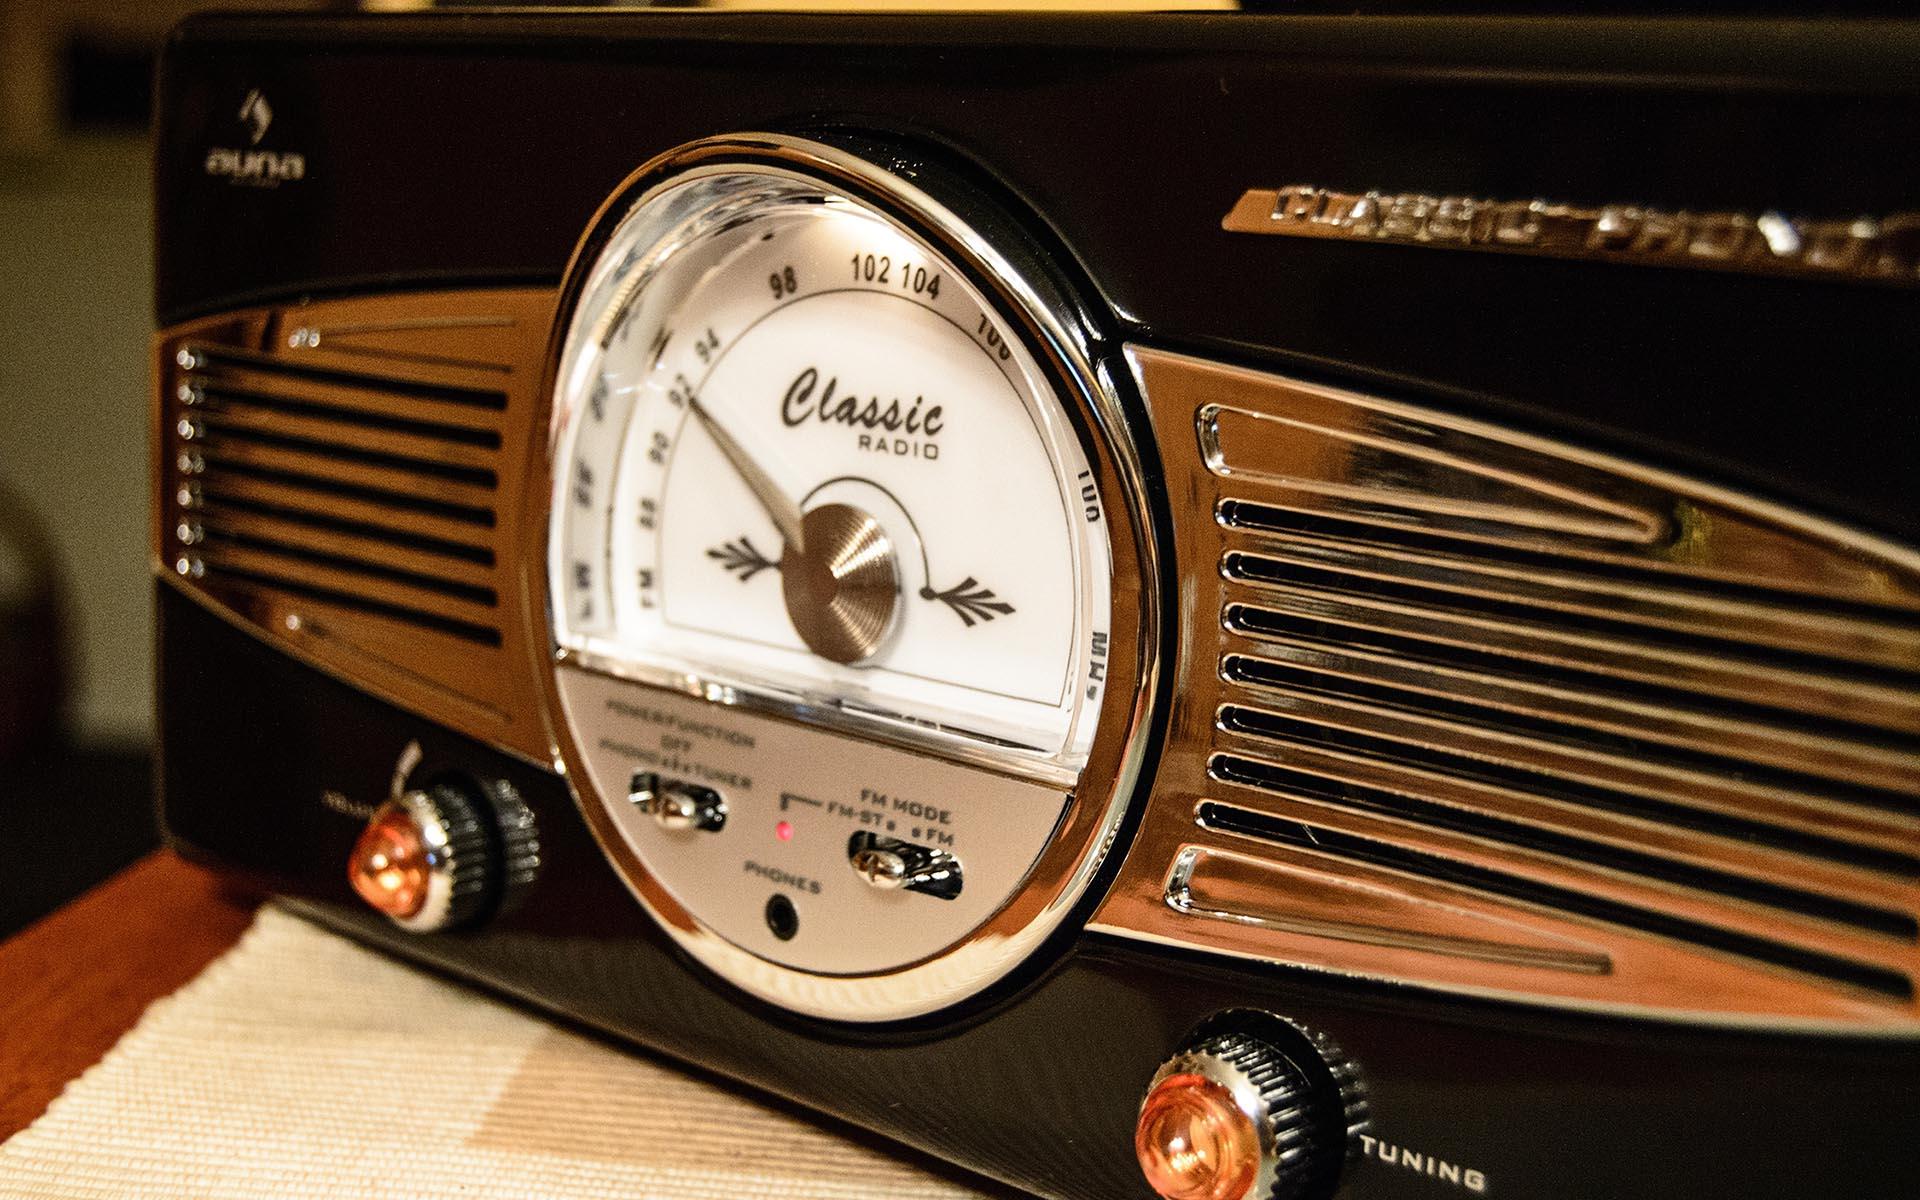 Petya Developers Break Radio Silence, Demand $250k